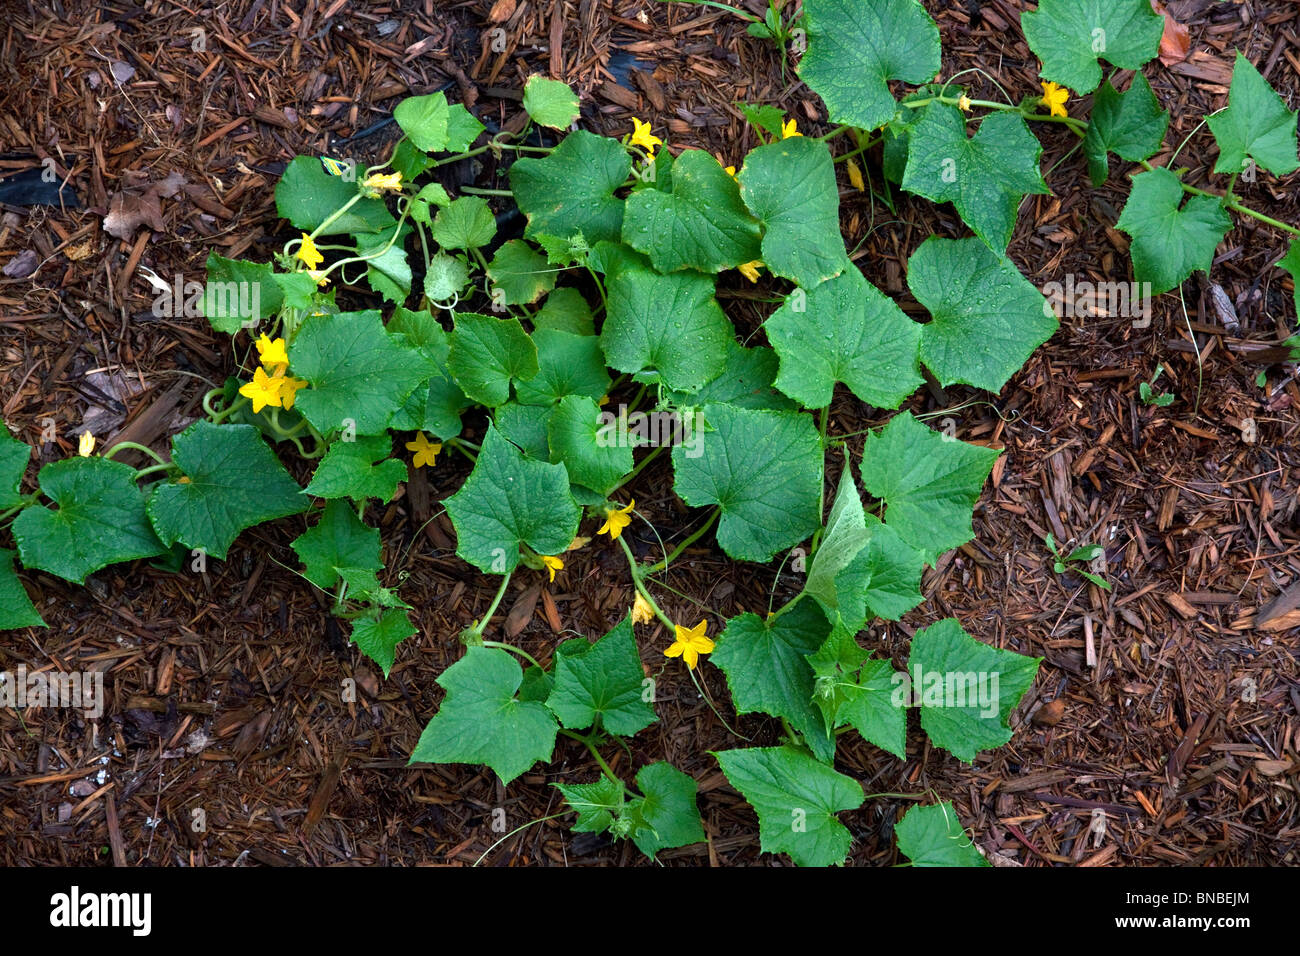 Garden Cucumbers in bloom (Cucumis sativus) E USA Stock Photo